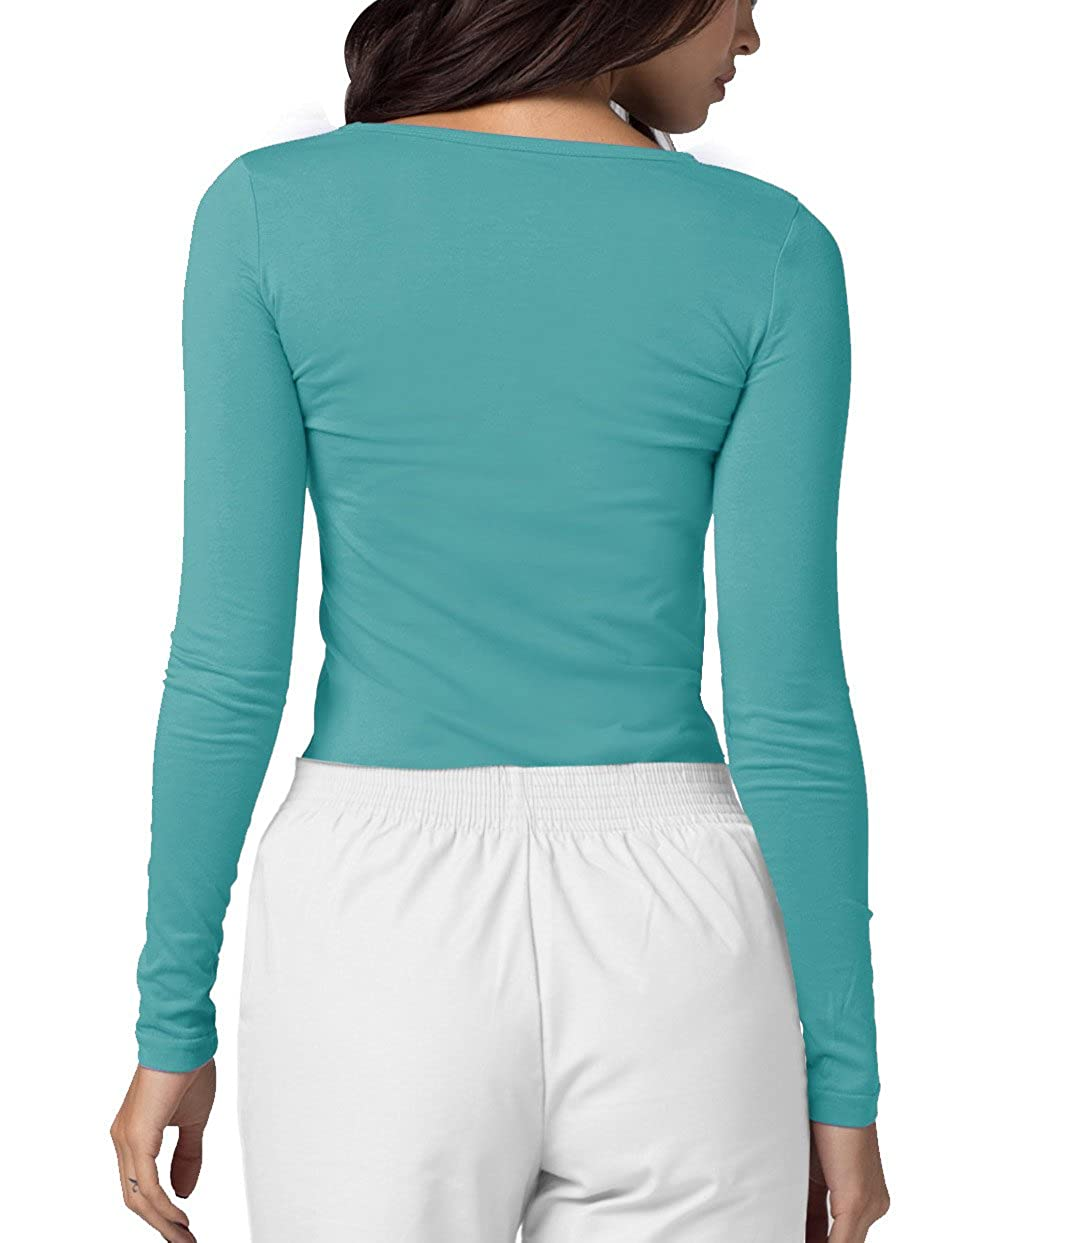 530ef600bf8 ADAR UNIFORMS - Underscrub Medical Long Sleeve Tee for Women: Amazon.co.uk:  Clothing